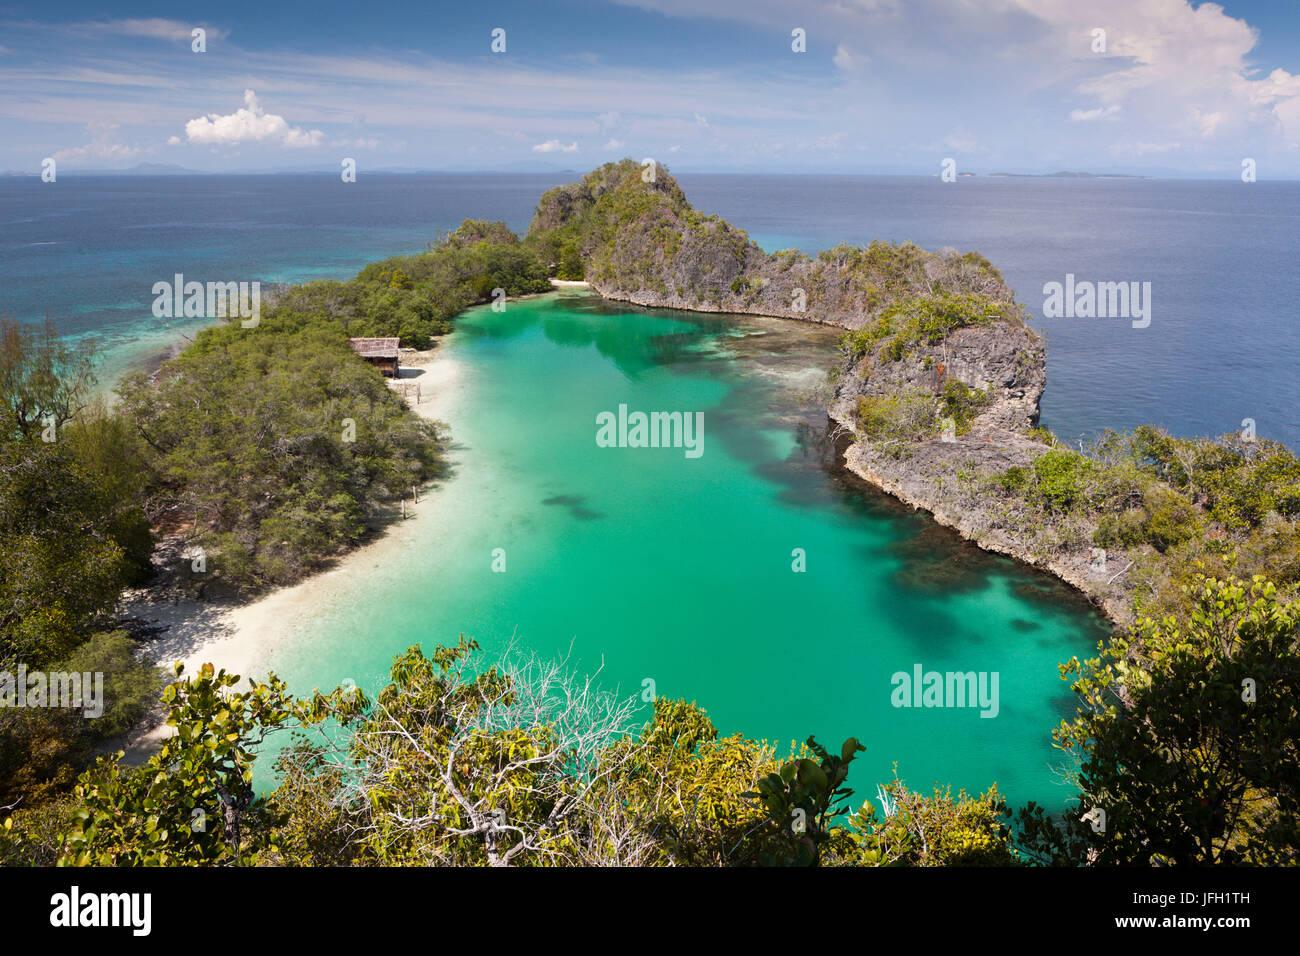 Rufus Bay Lagune with Fam of Iceland, Raja Ampat, west Papua, Indonesia - Stock Image